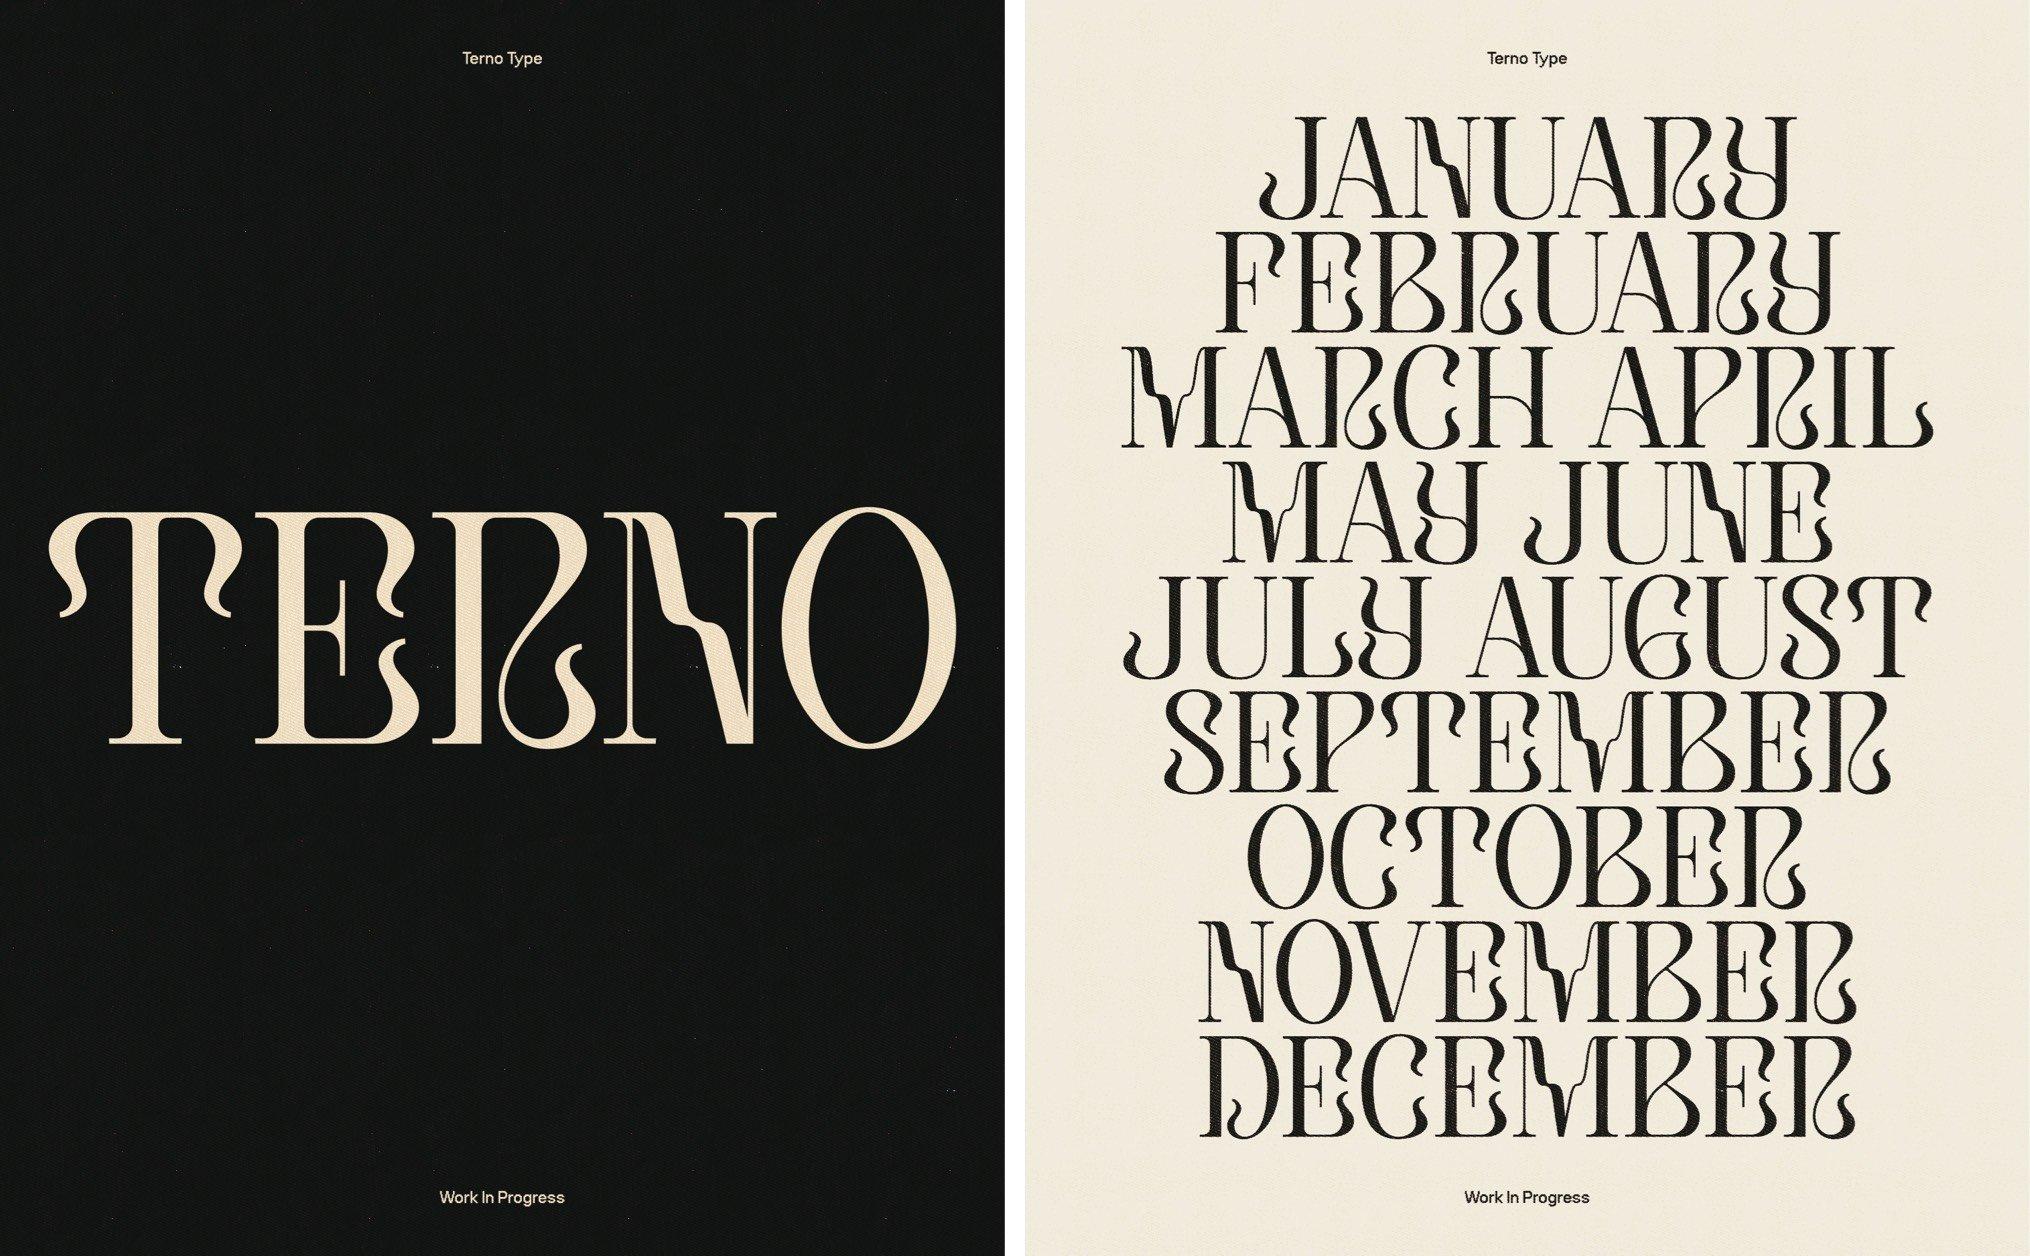 terno-typeface-jo-malinis-img-04